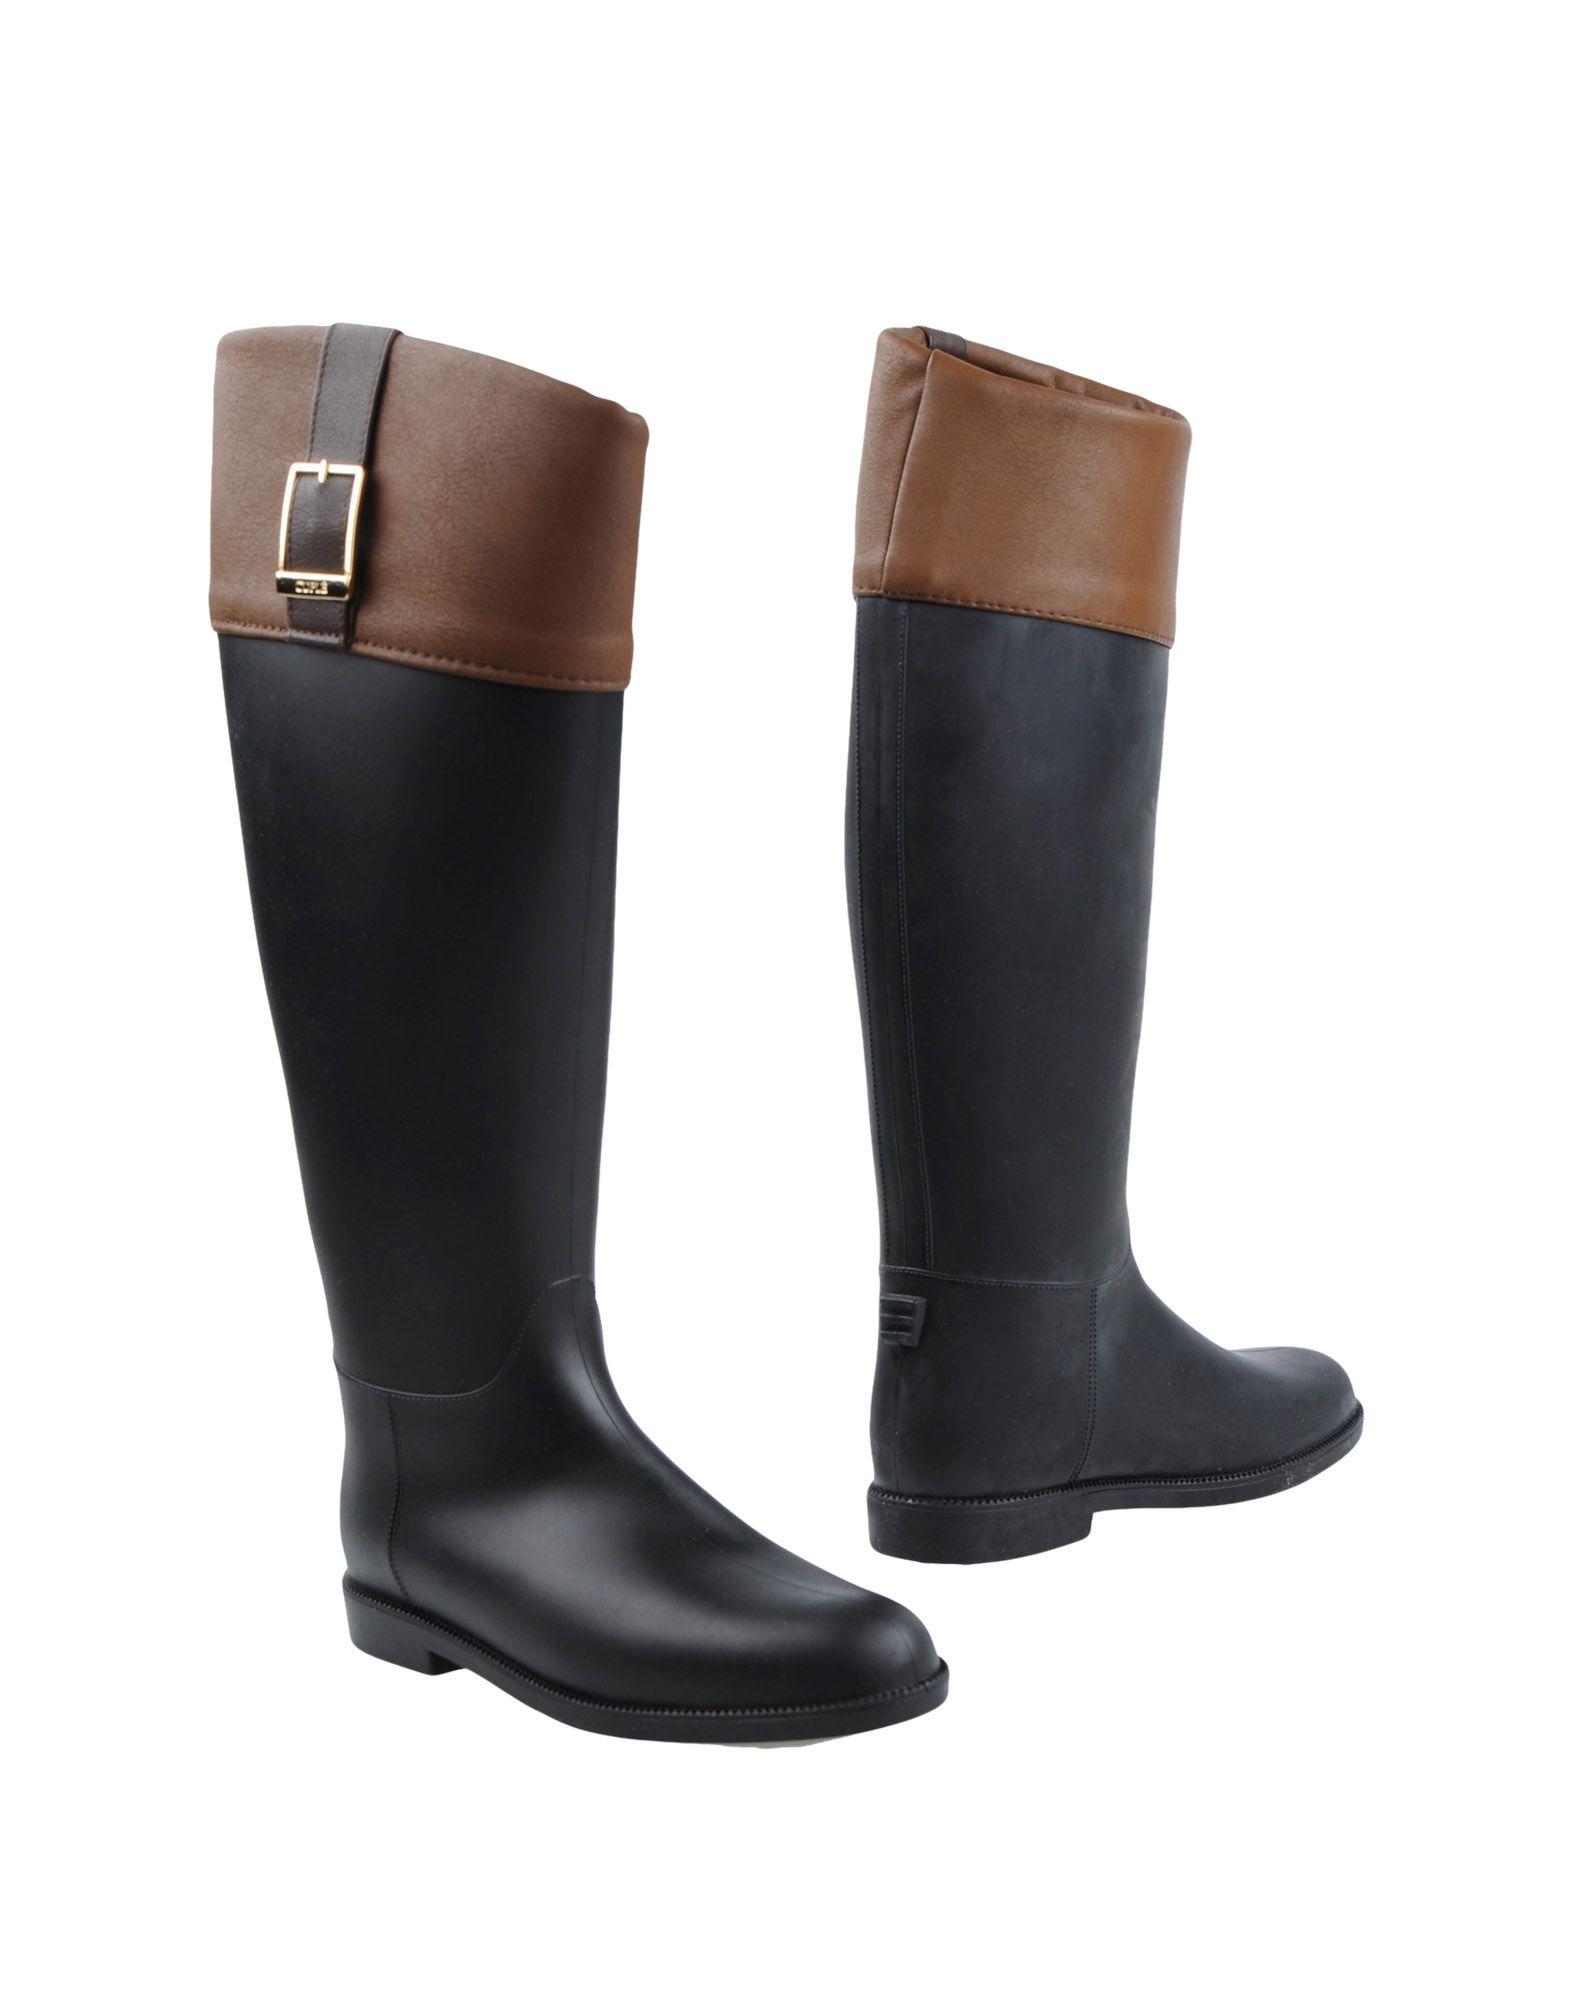 Cuplé Boots Boots - Women Cuplé Boots Cuplé online on  United Kingdom - 11311504SB a4d575